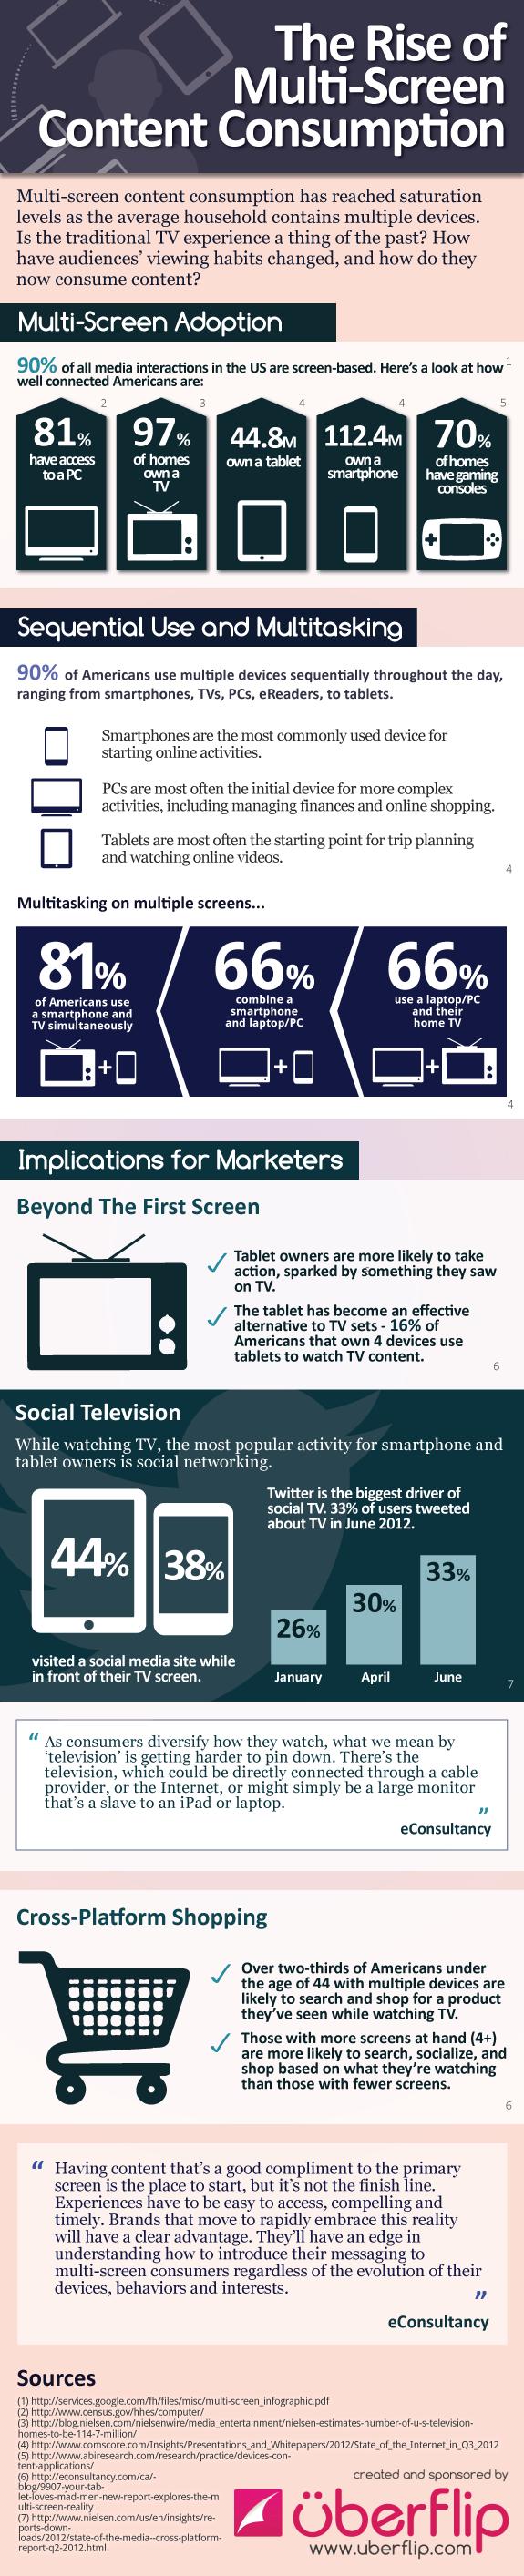 infographic_content_consume_device_uberflip